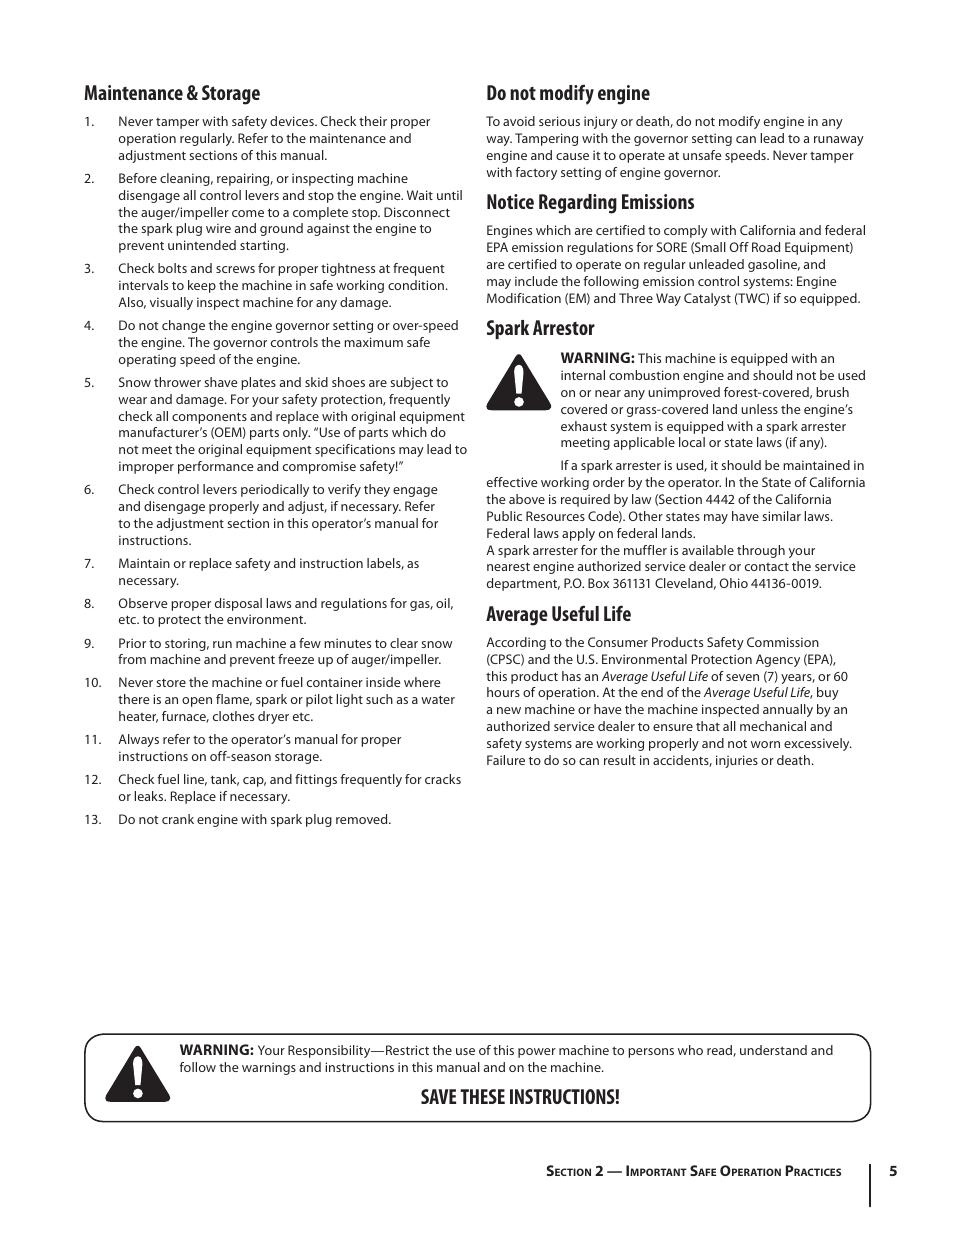 Maintenance & storage, Do not modify engine, Notice regarding emissions |  Spark arrestor,